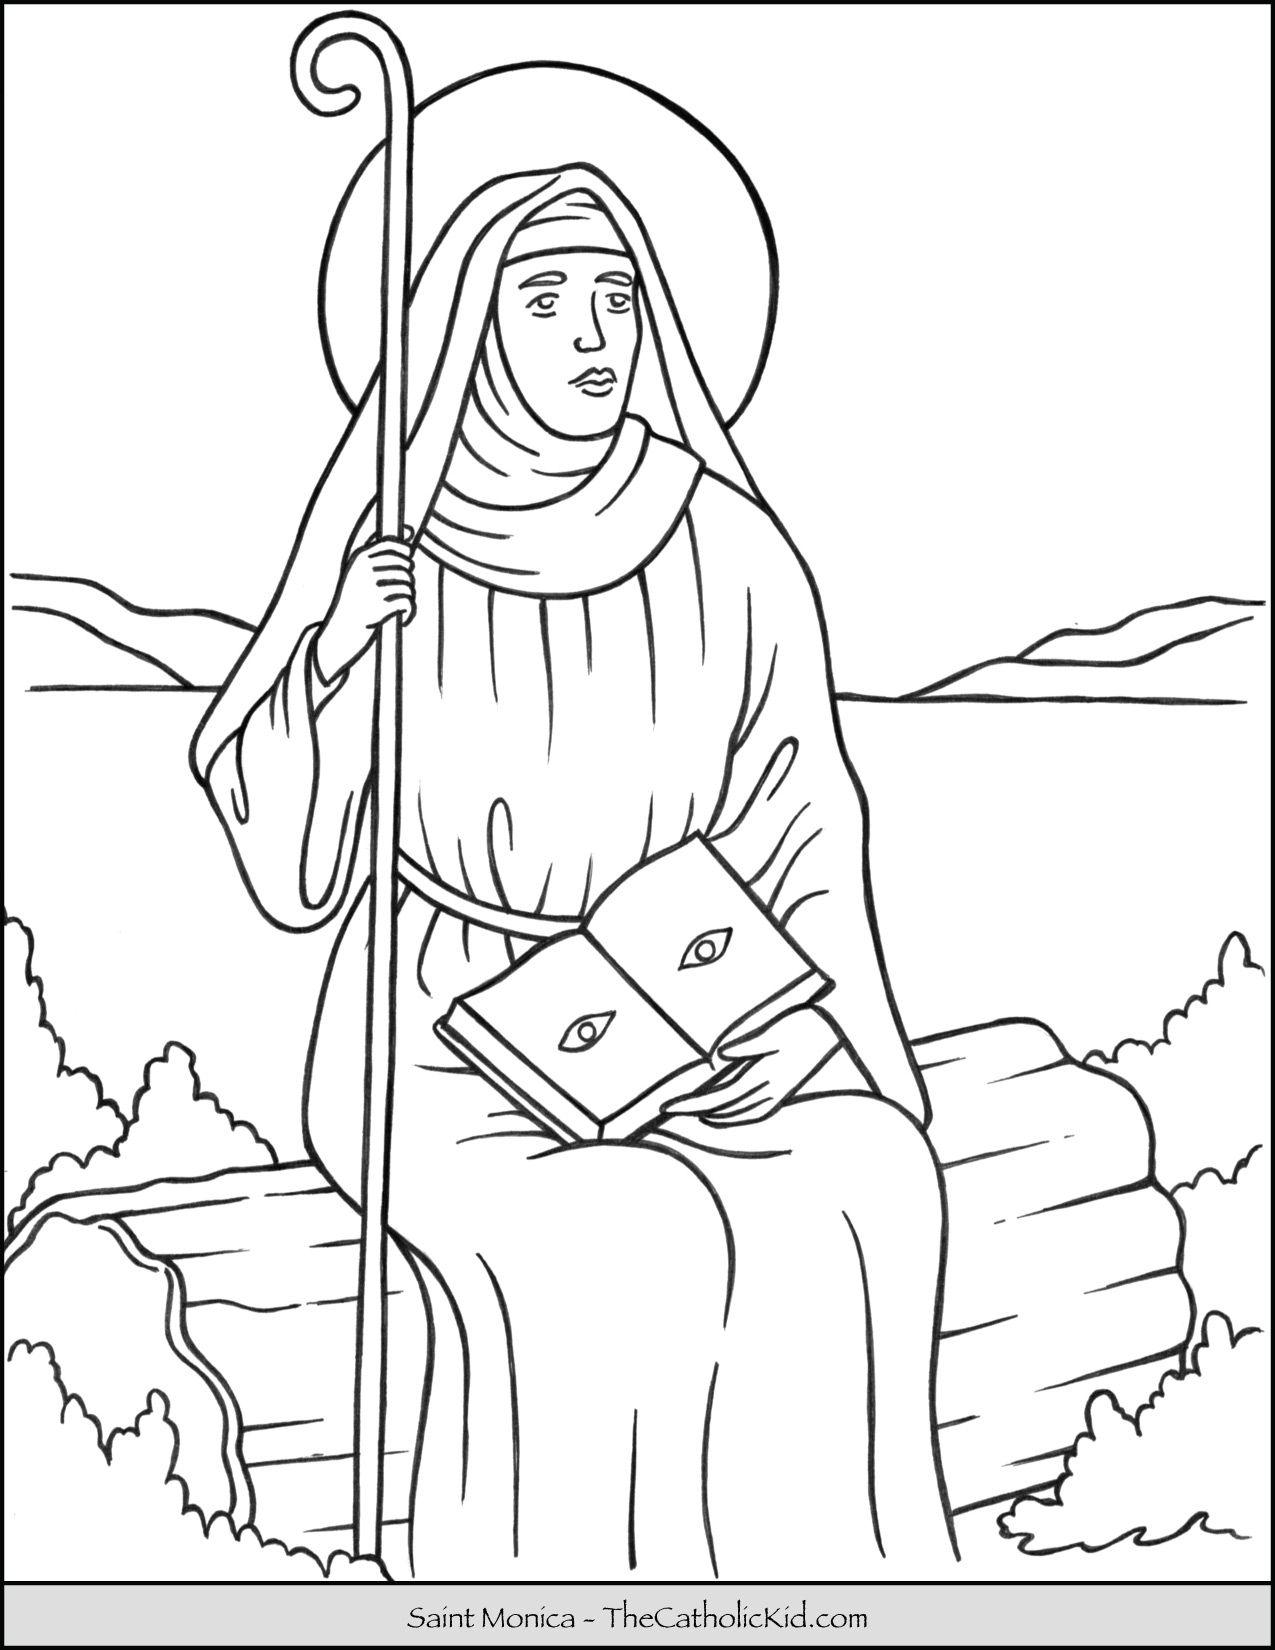 Saint Monica Coloring Page Thecatholickid Com St Monica Saint